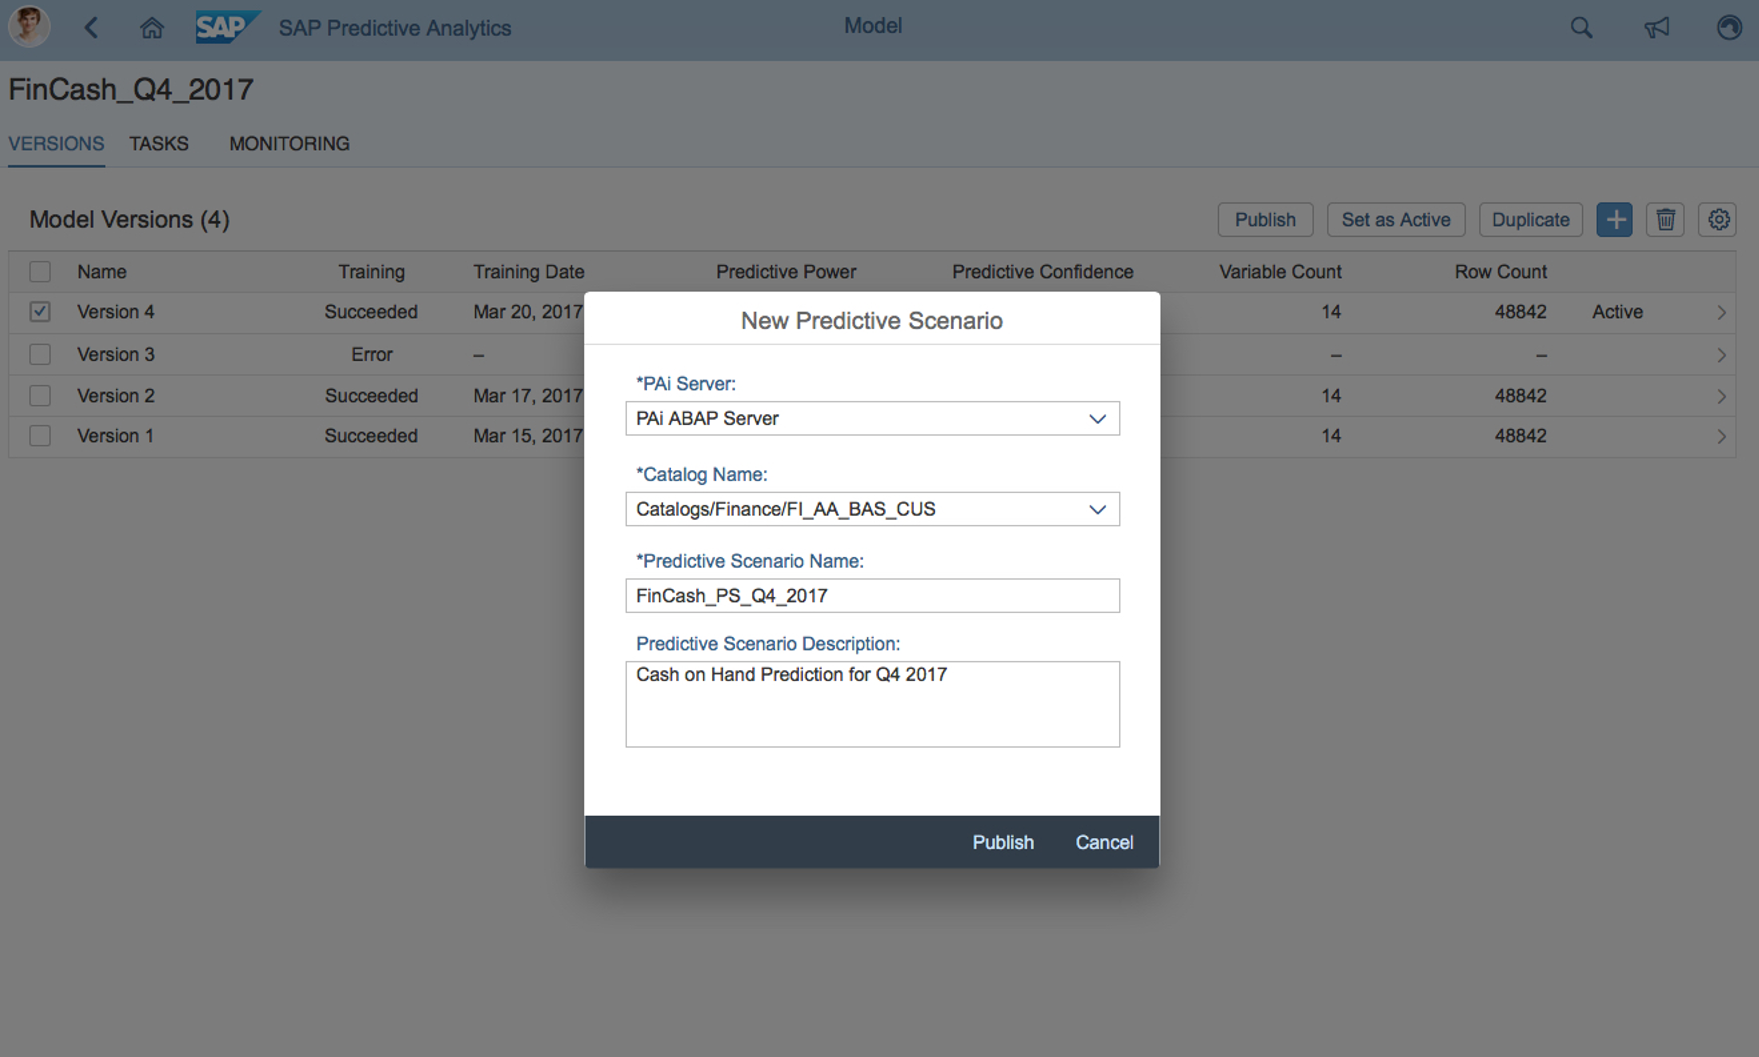 SAP predictive analytics screen shot